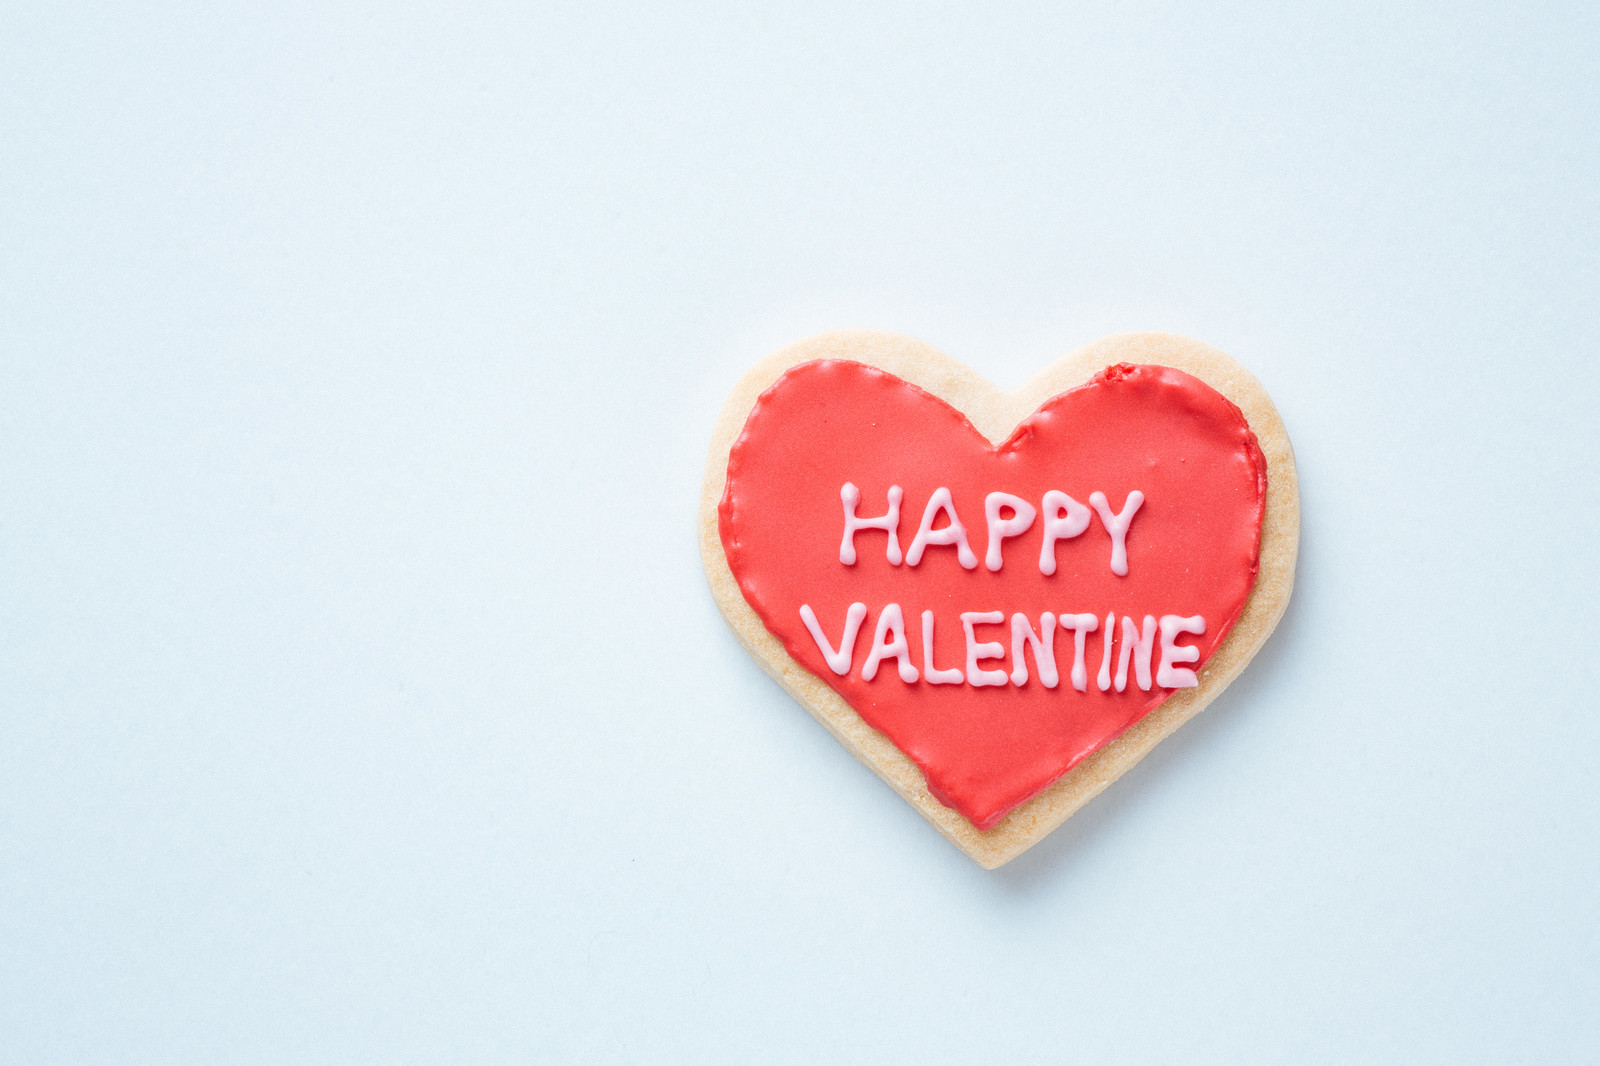 「HAPPY VALENTINE(ハートのクッキー)」の写真